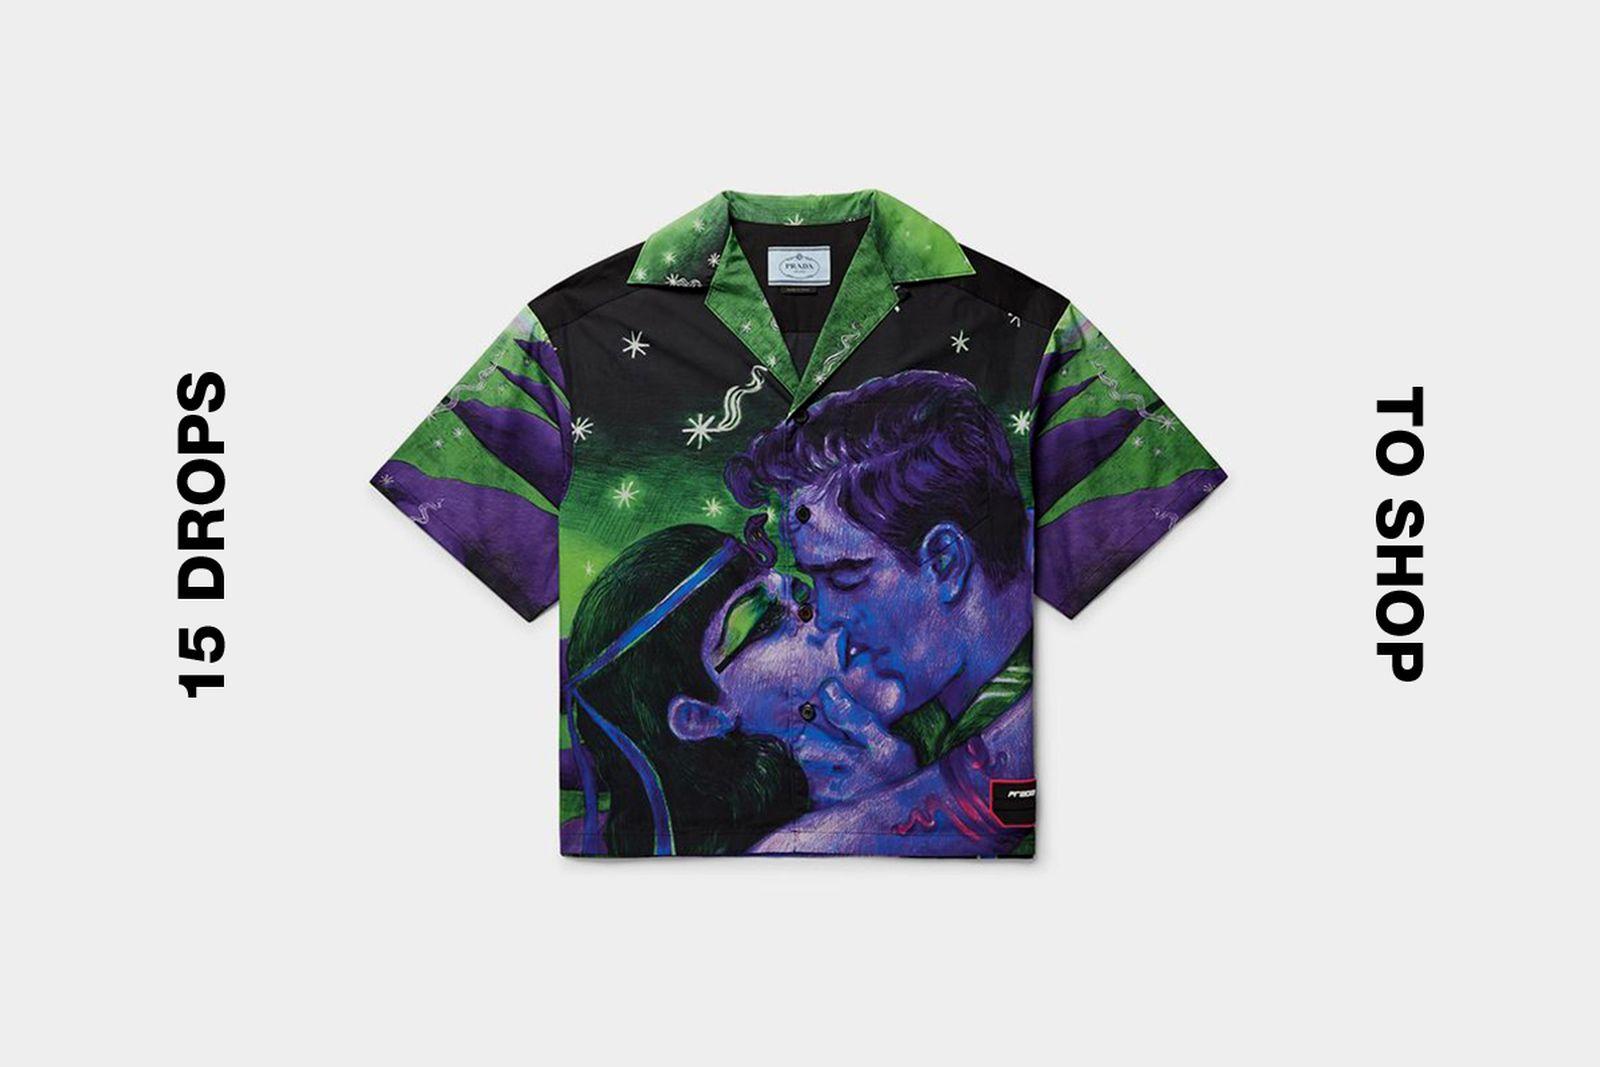 prada bowling shirt best drop buy Gucci Loewe Nike SB